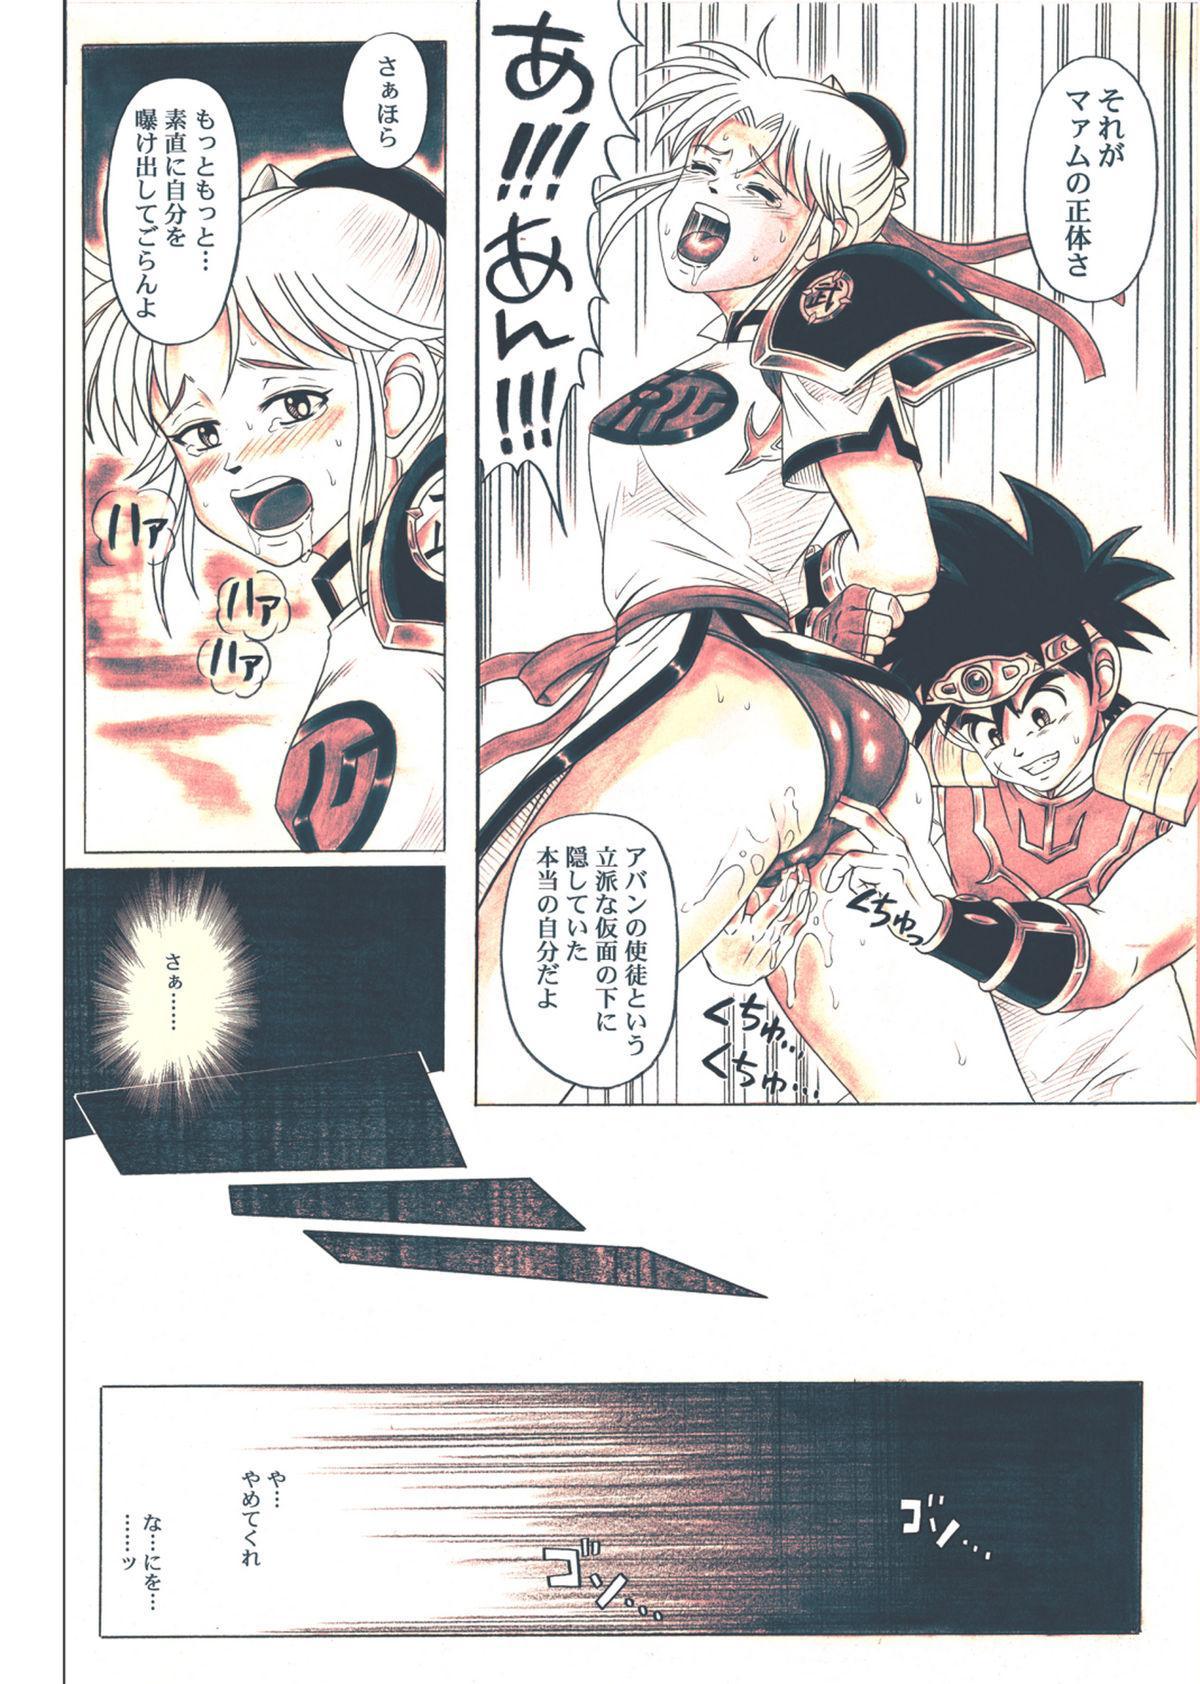 [Cyclone (Reizei, Izumi)] STAR TAC IDO ~Youkuso Haja no Doukutsu he~ Chuuhen Download edition (Dragon Warrior: Dai's Great Adventure) [Digital] 119